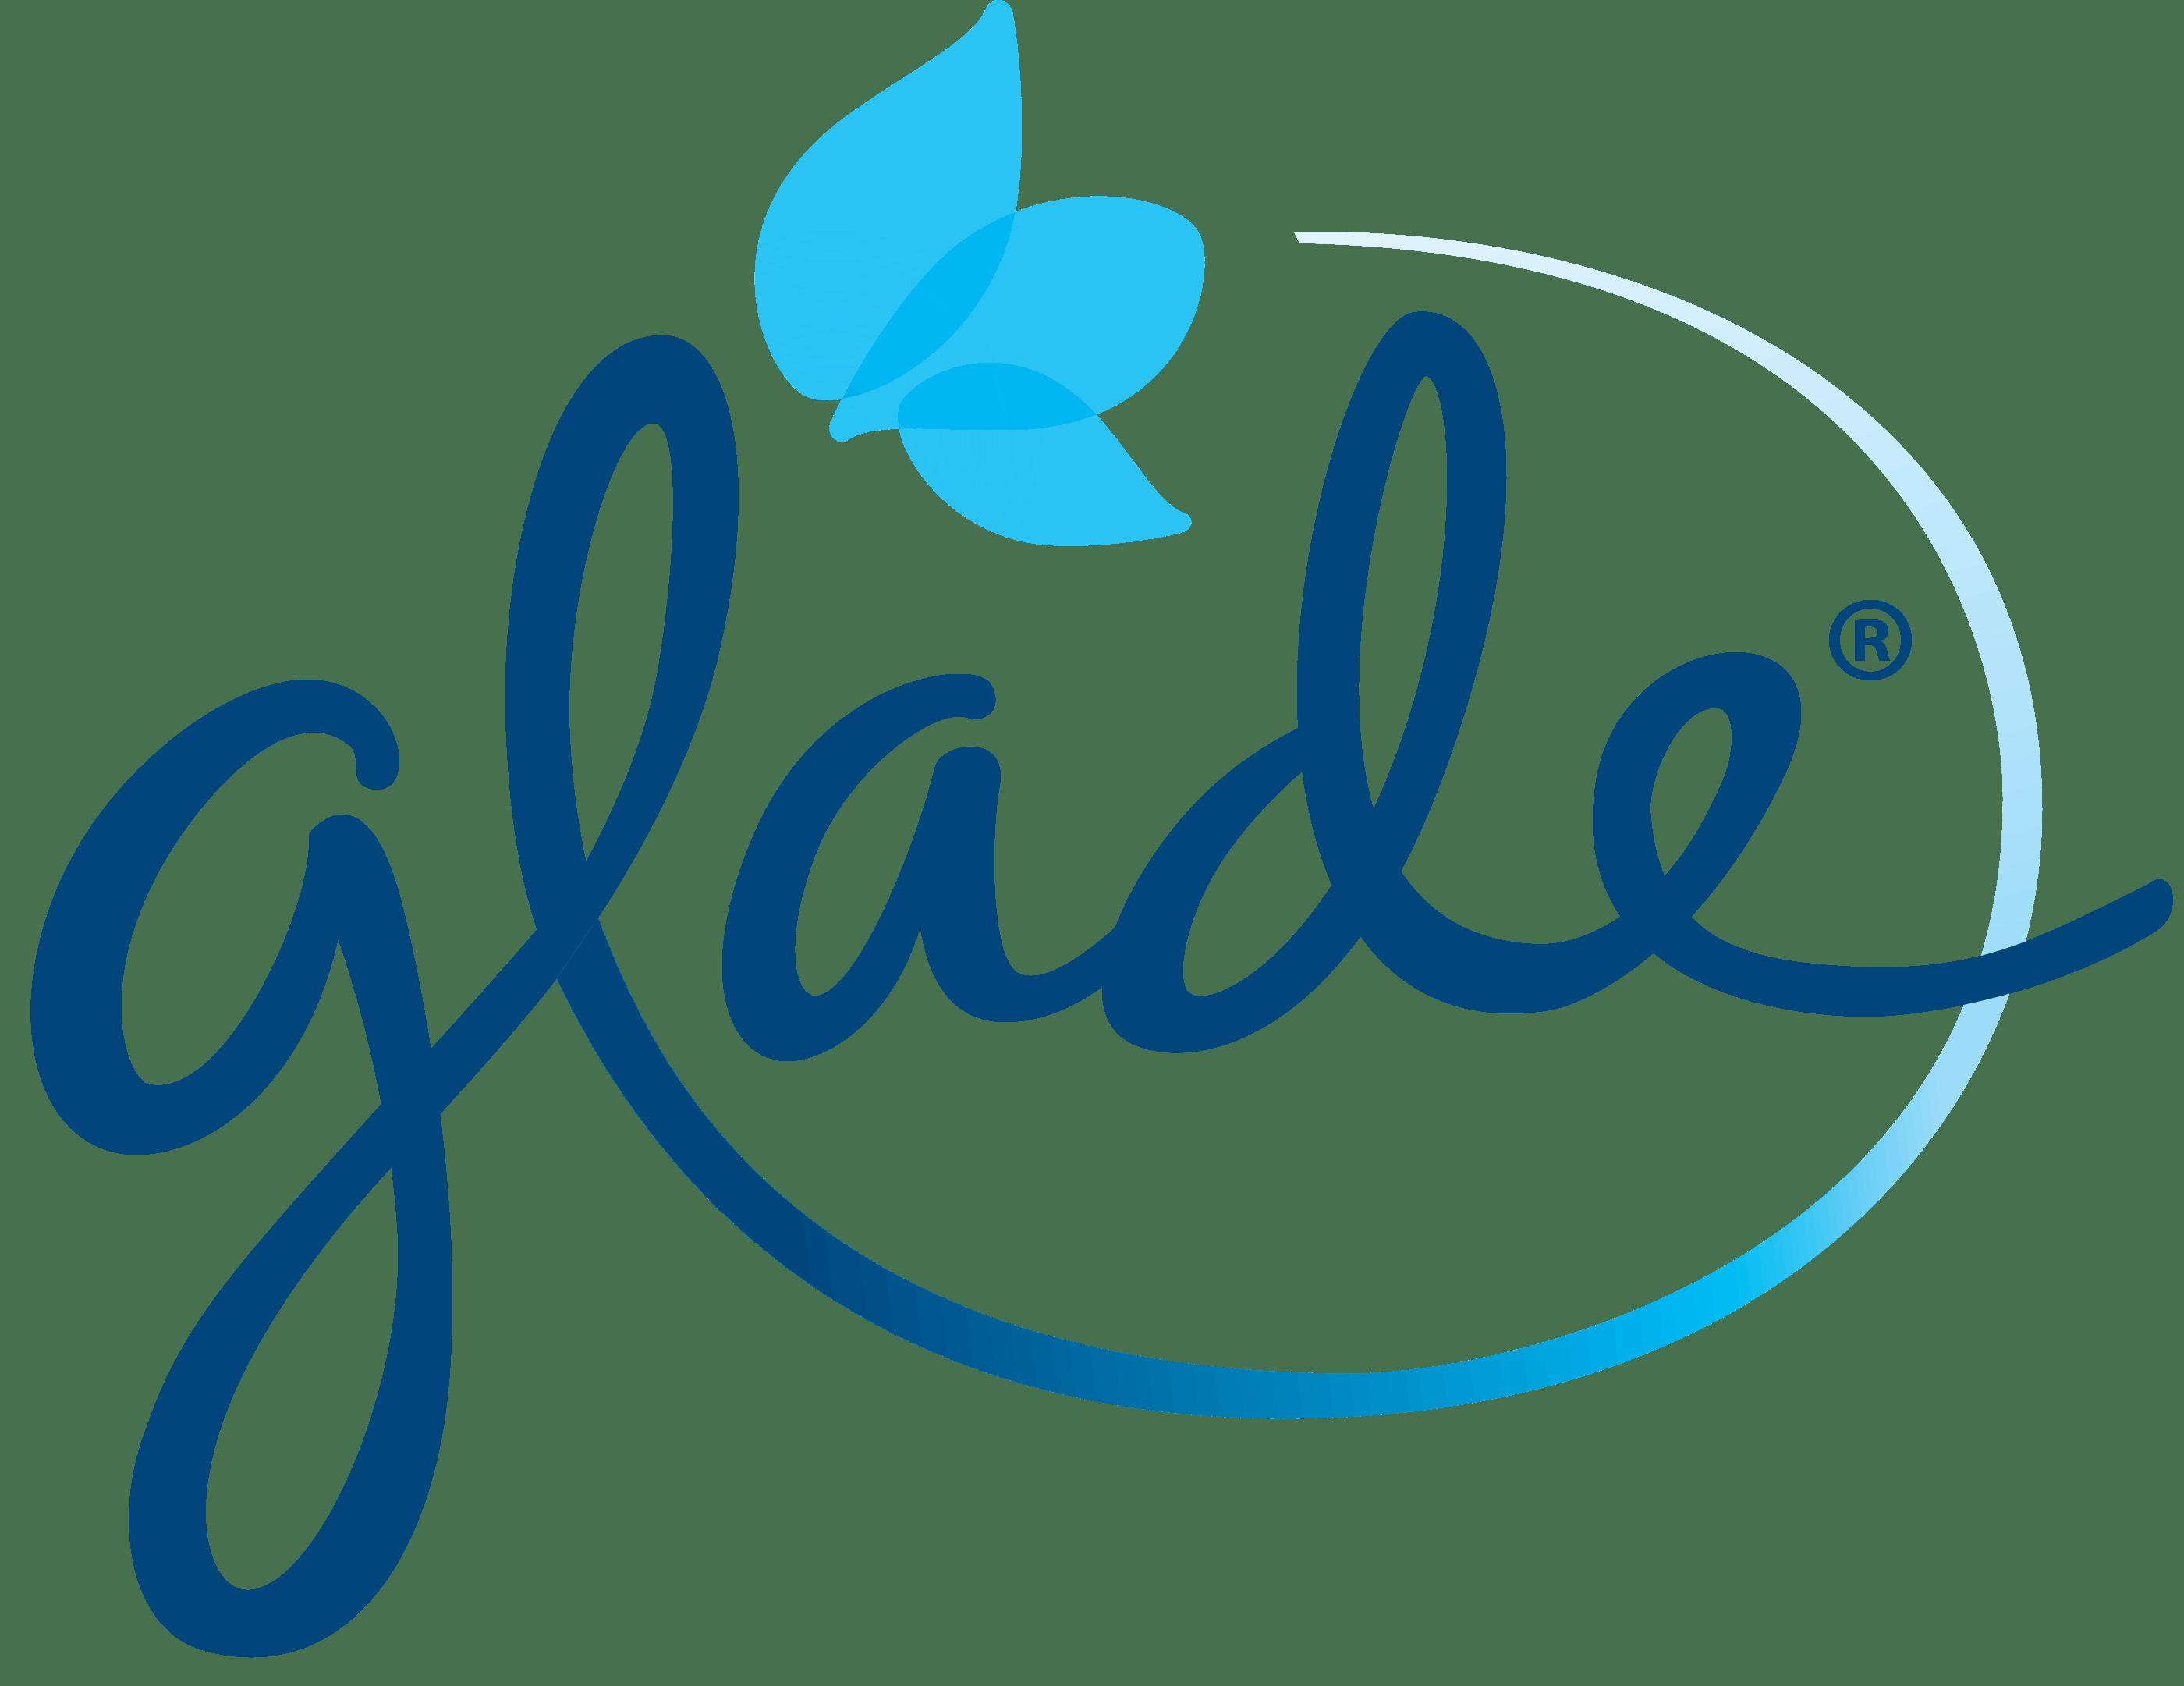 Glade Logo 2014 4c POS LG F 3 21